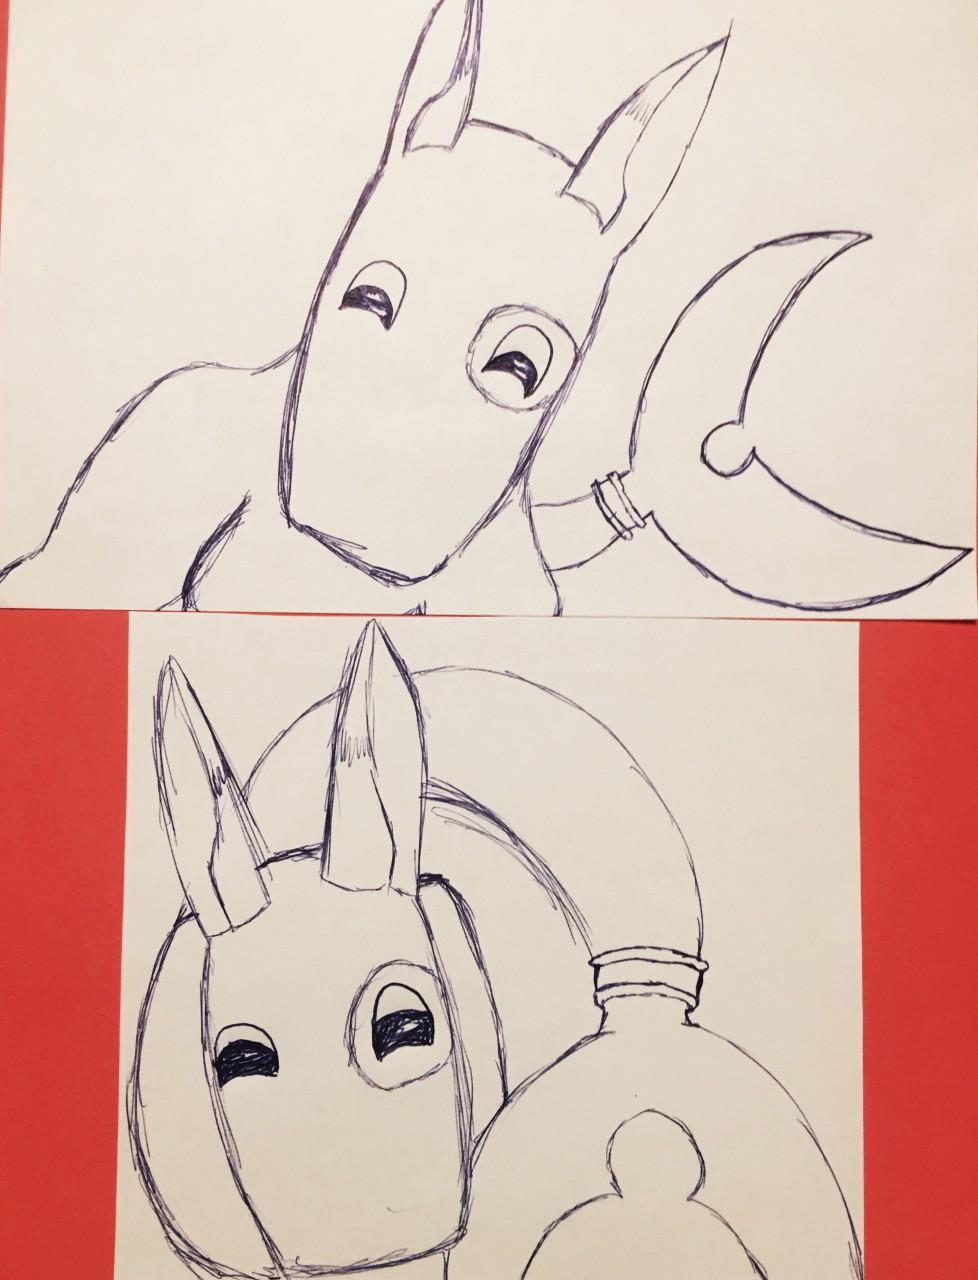 [My Art] Pen Doodles - Talia